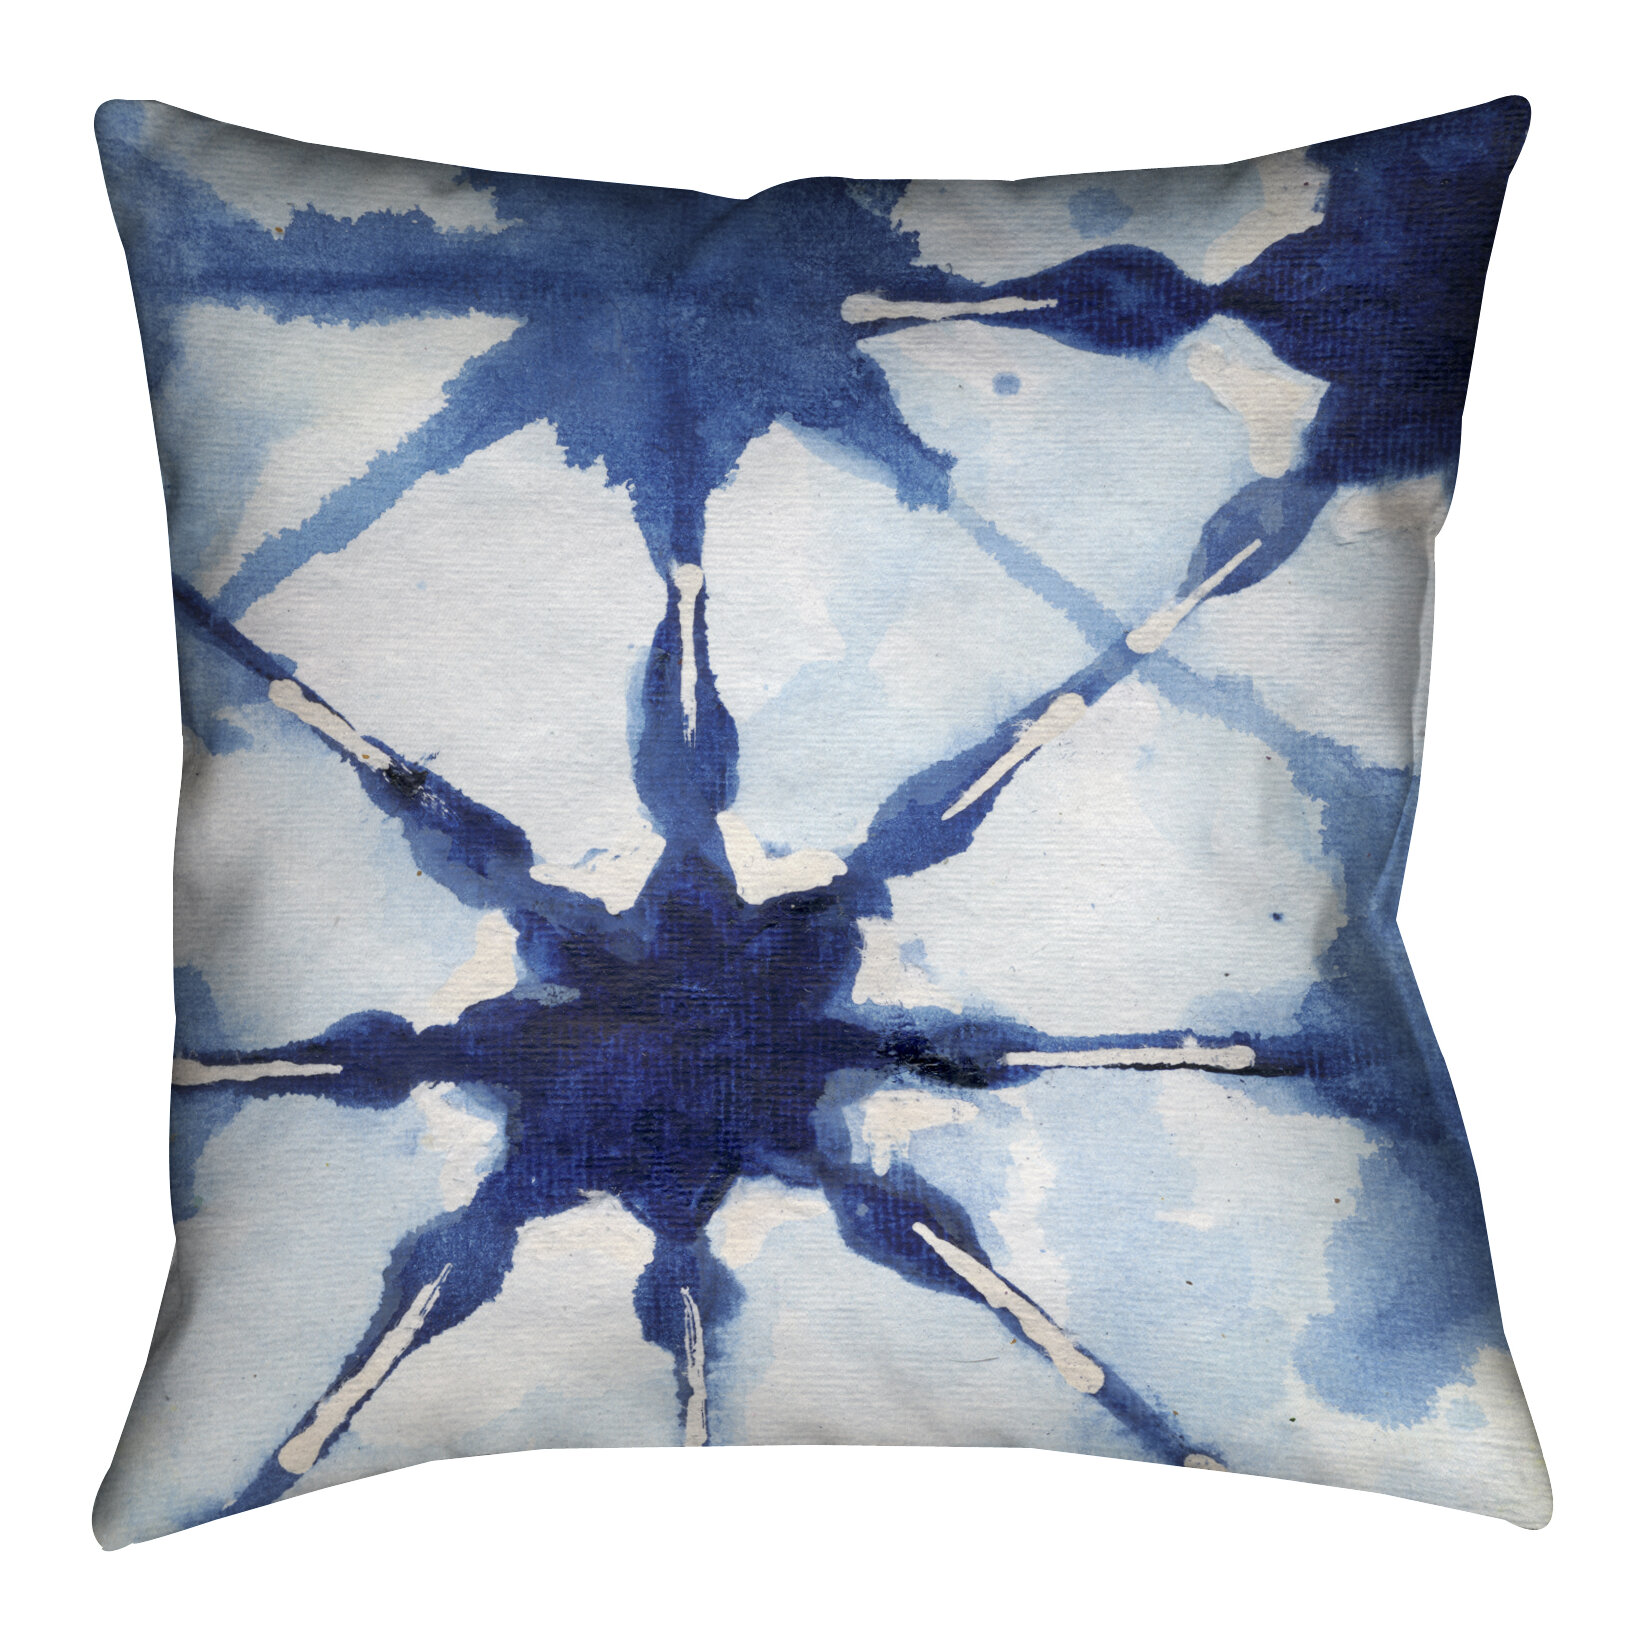 Lauralhome Brasher Shibori Ii Outdoor Throw Pillow Wayfair